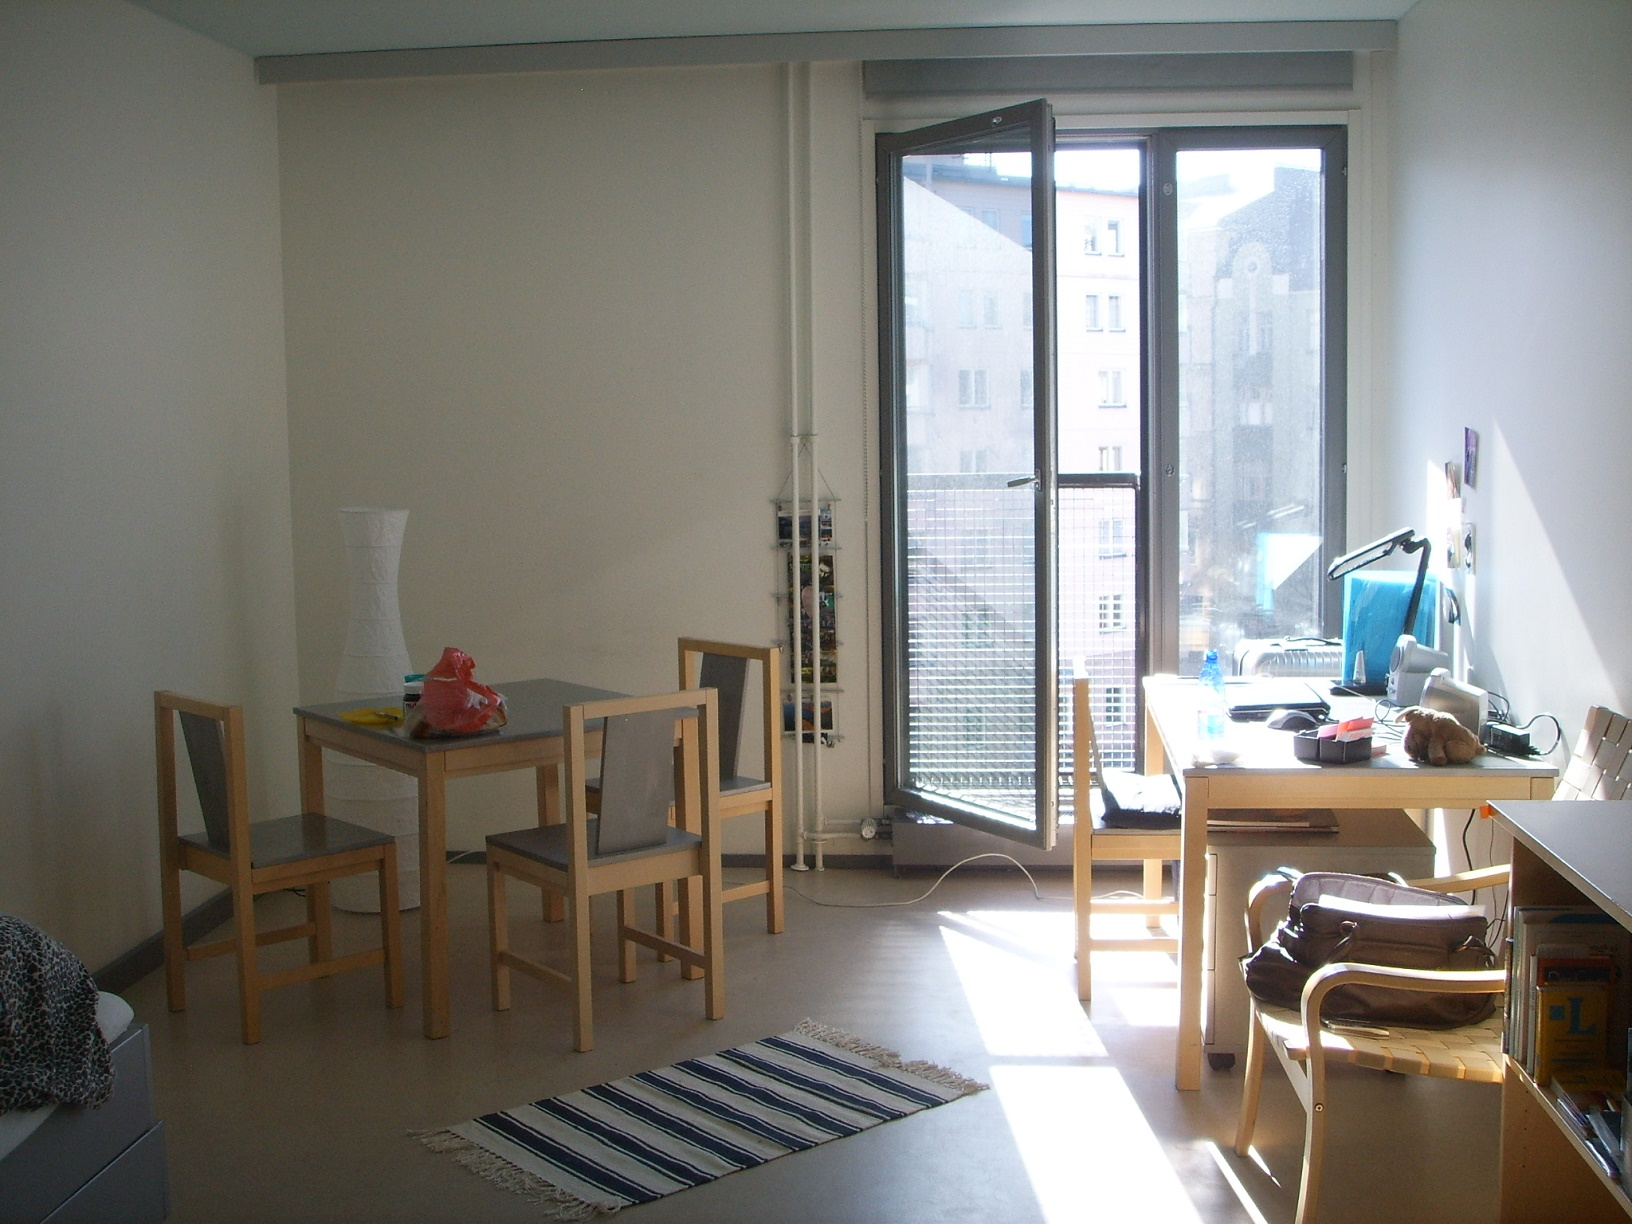 Wohnung in Helsinki